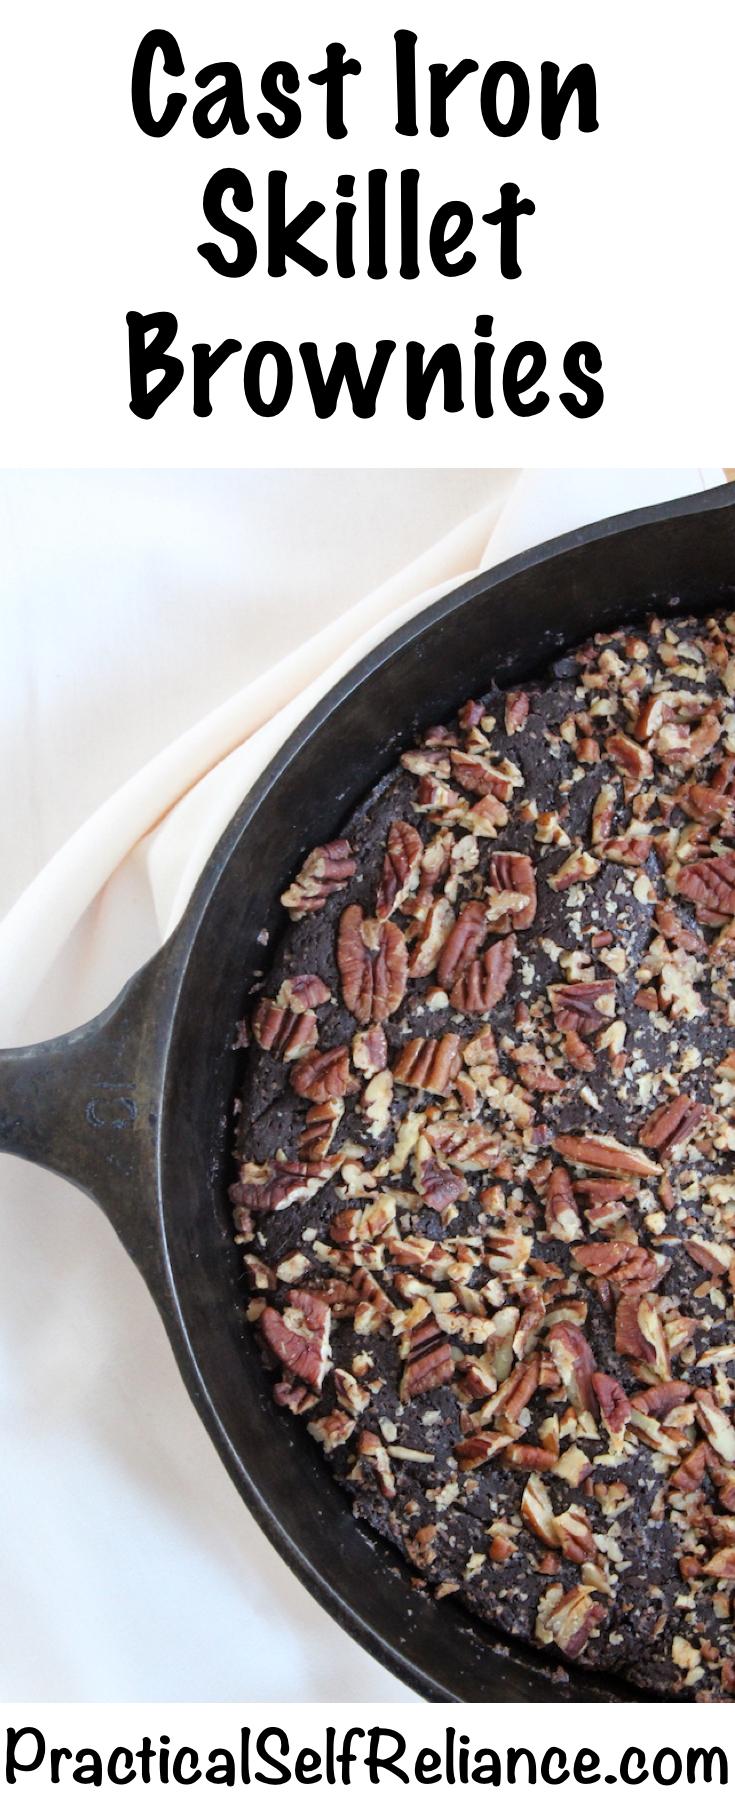 Cast Iron Skillet Brownies #brownies #brownierecipe #castironrecipe #dessertrecipe #baking